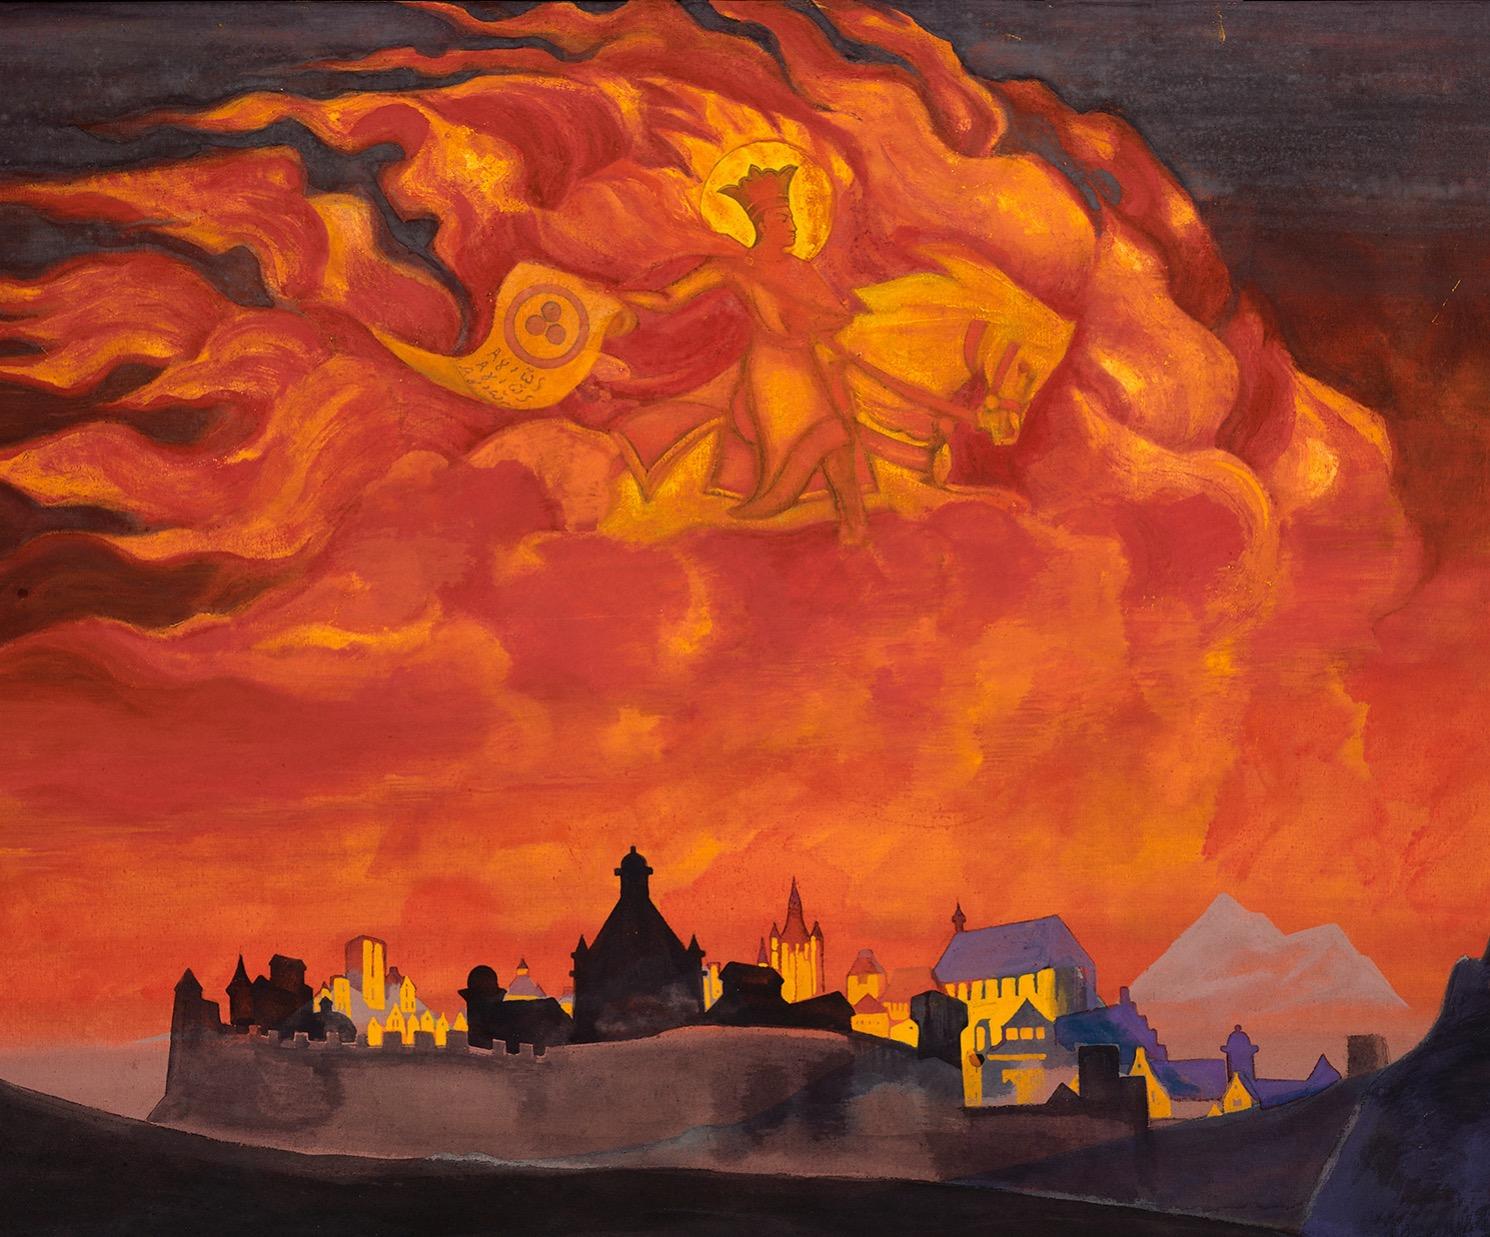 saint-sophia-the-almighty-wisdom-1932_Fotor